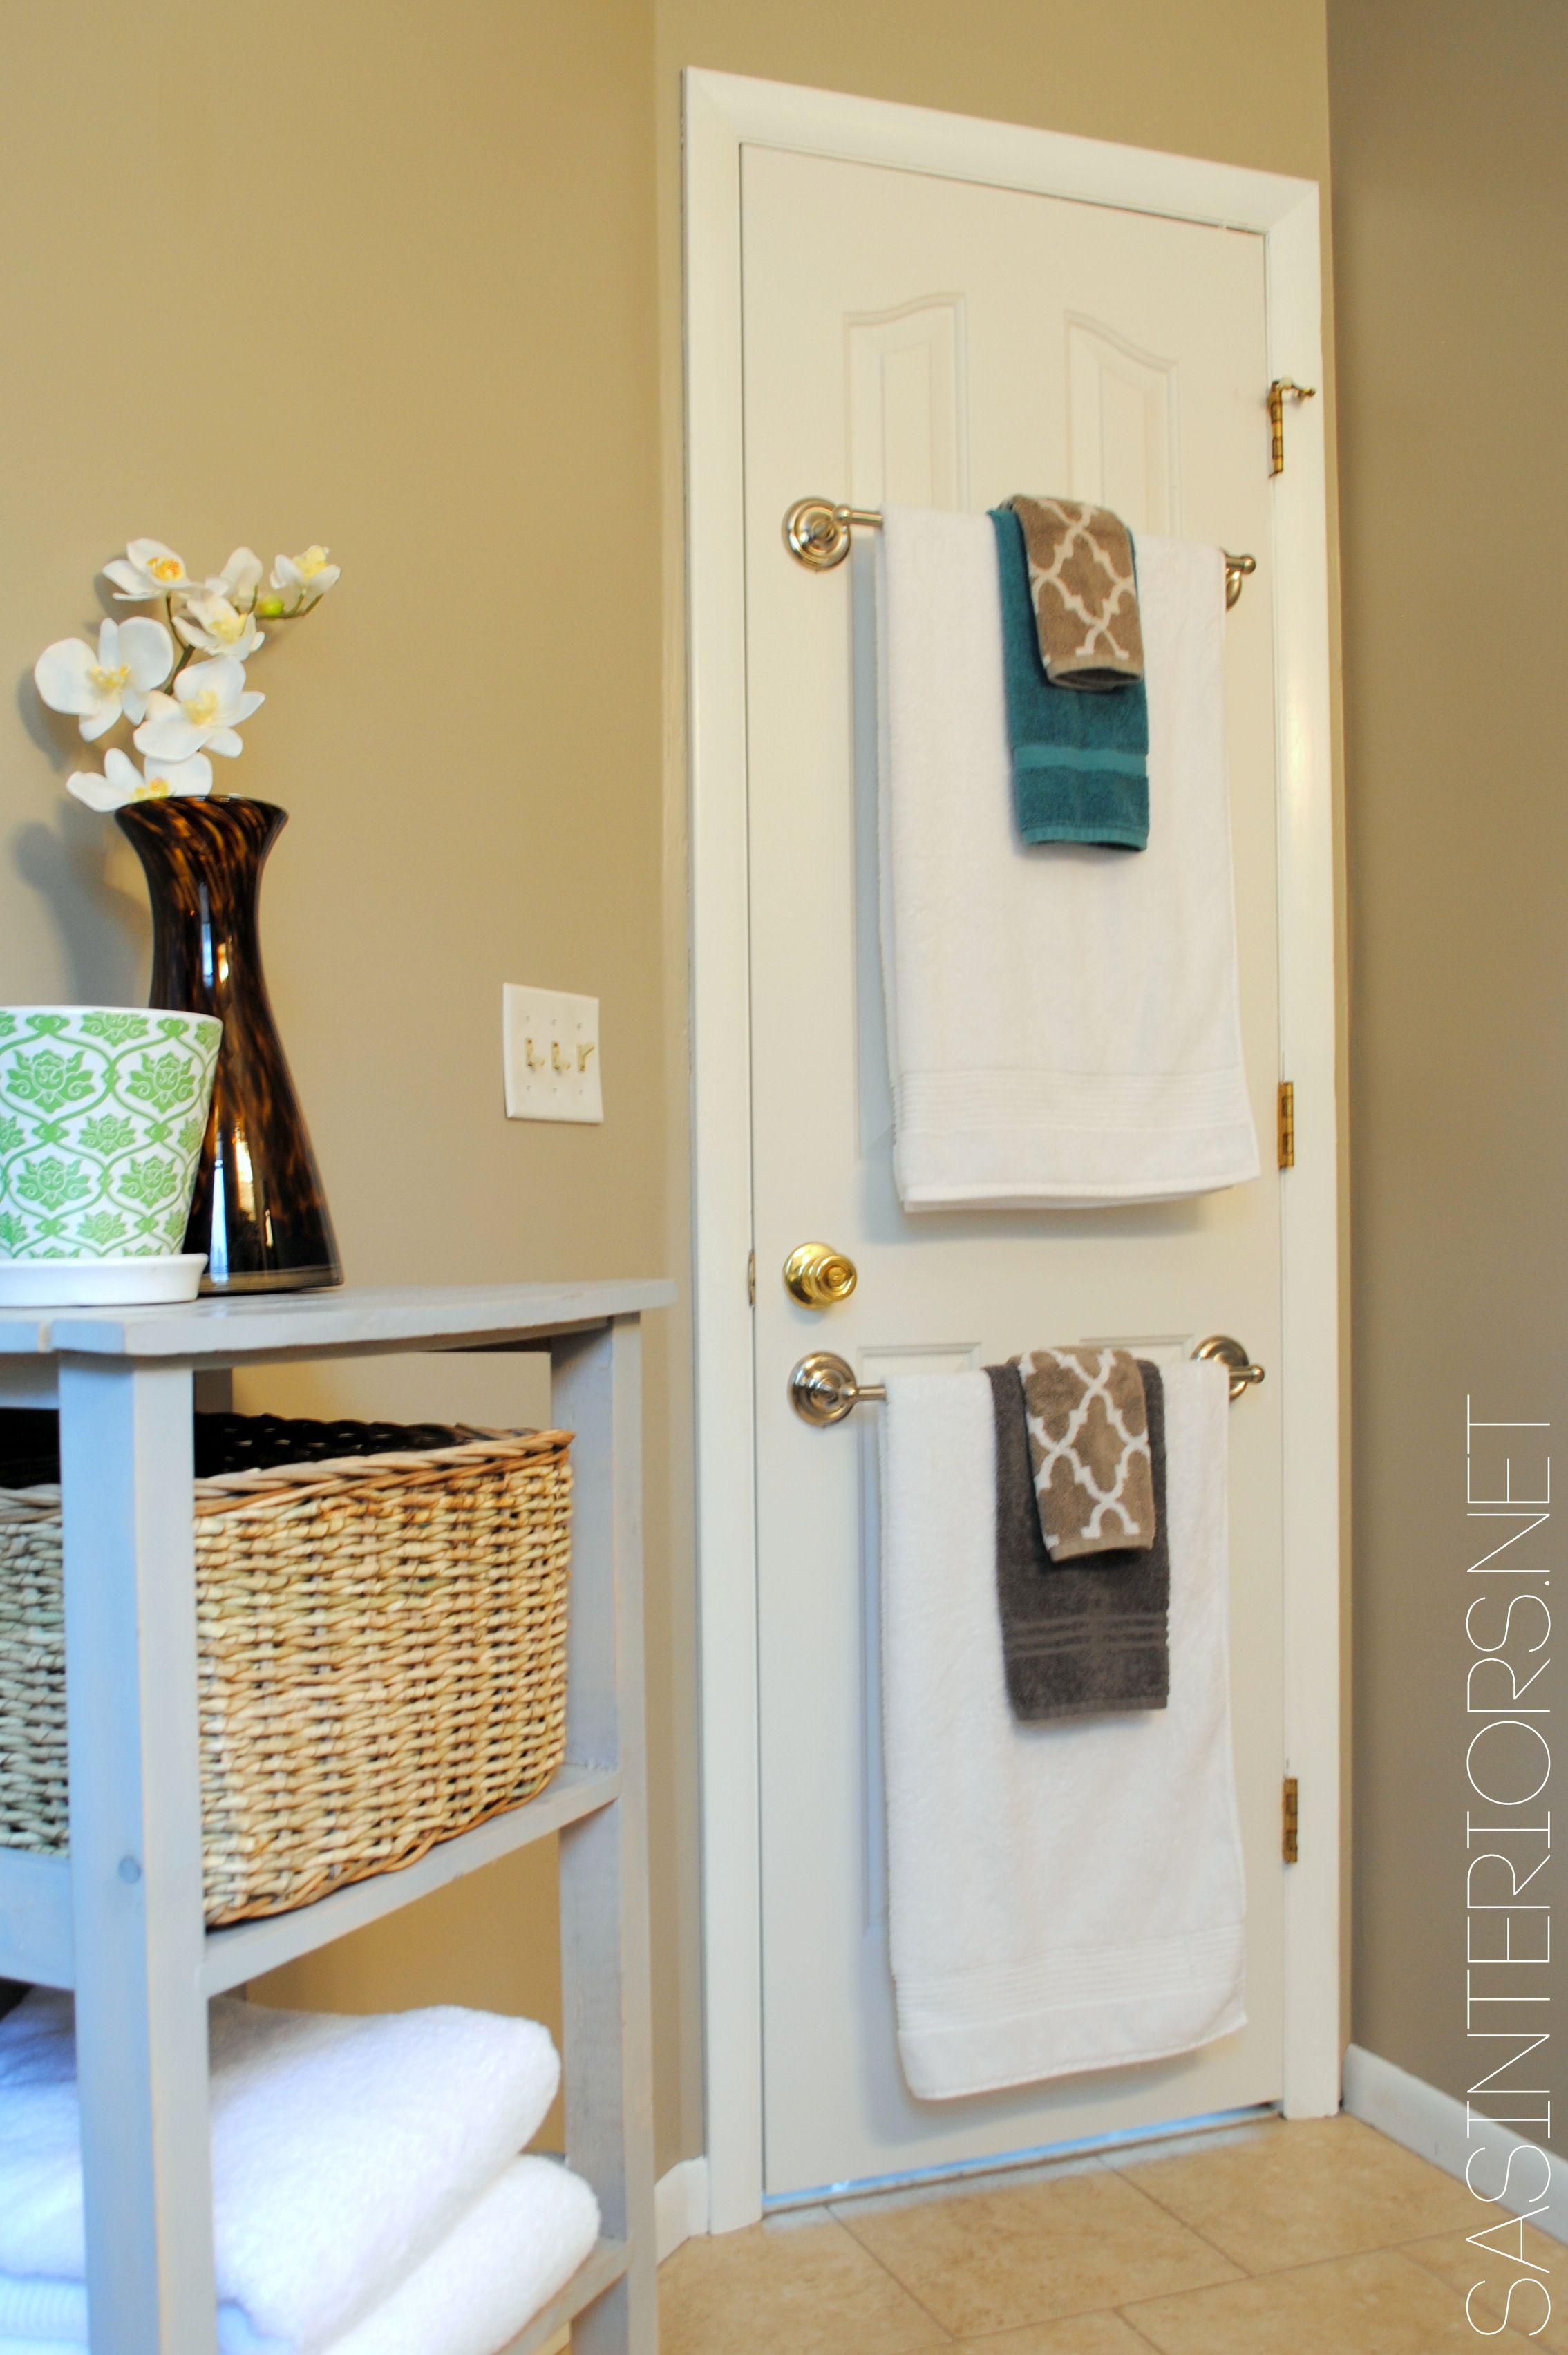 29 Sneaky DIY Small Space Storage and Organization Ideas (on a budget!)  Bathroom DoorsHanging Bathroom TowelsDecorative Bathroom TowelsTowel Racks  ...